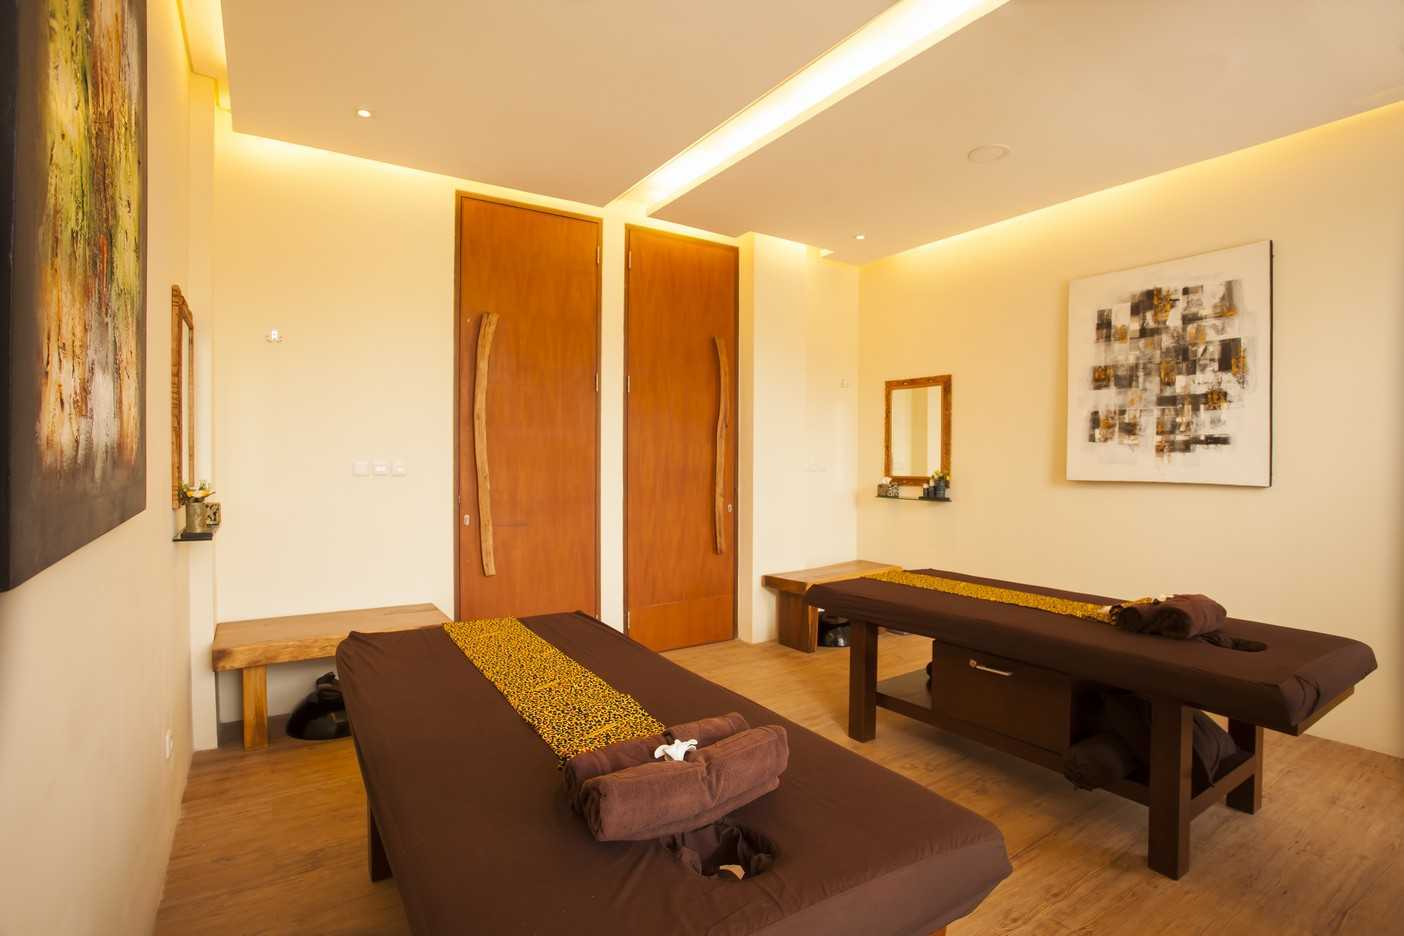 Emporio Architect Zen Family Spa Nusa Dua Benoa, Kec. Kuta Sel., Kabupaten Badung, Bali, Indonesia Benoa, Kec. Kuta Sel., Kabupaten Badung, Bali, Indonesia Emporio-Architect-Zen-Family-Spa-Nusa-Dua   72700